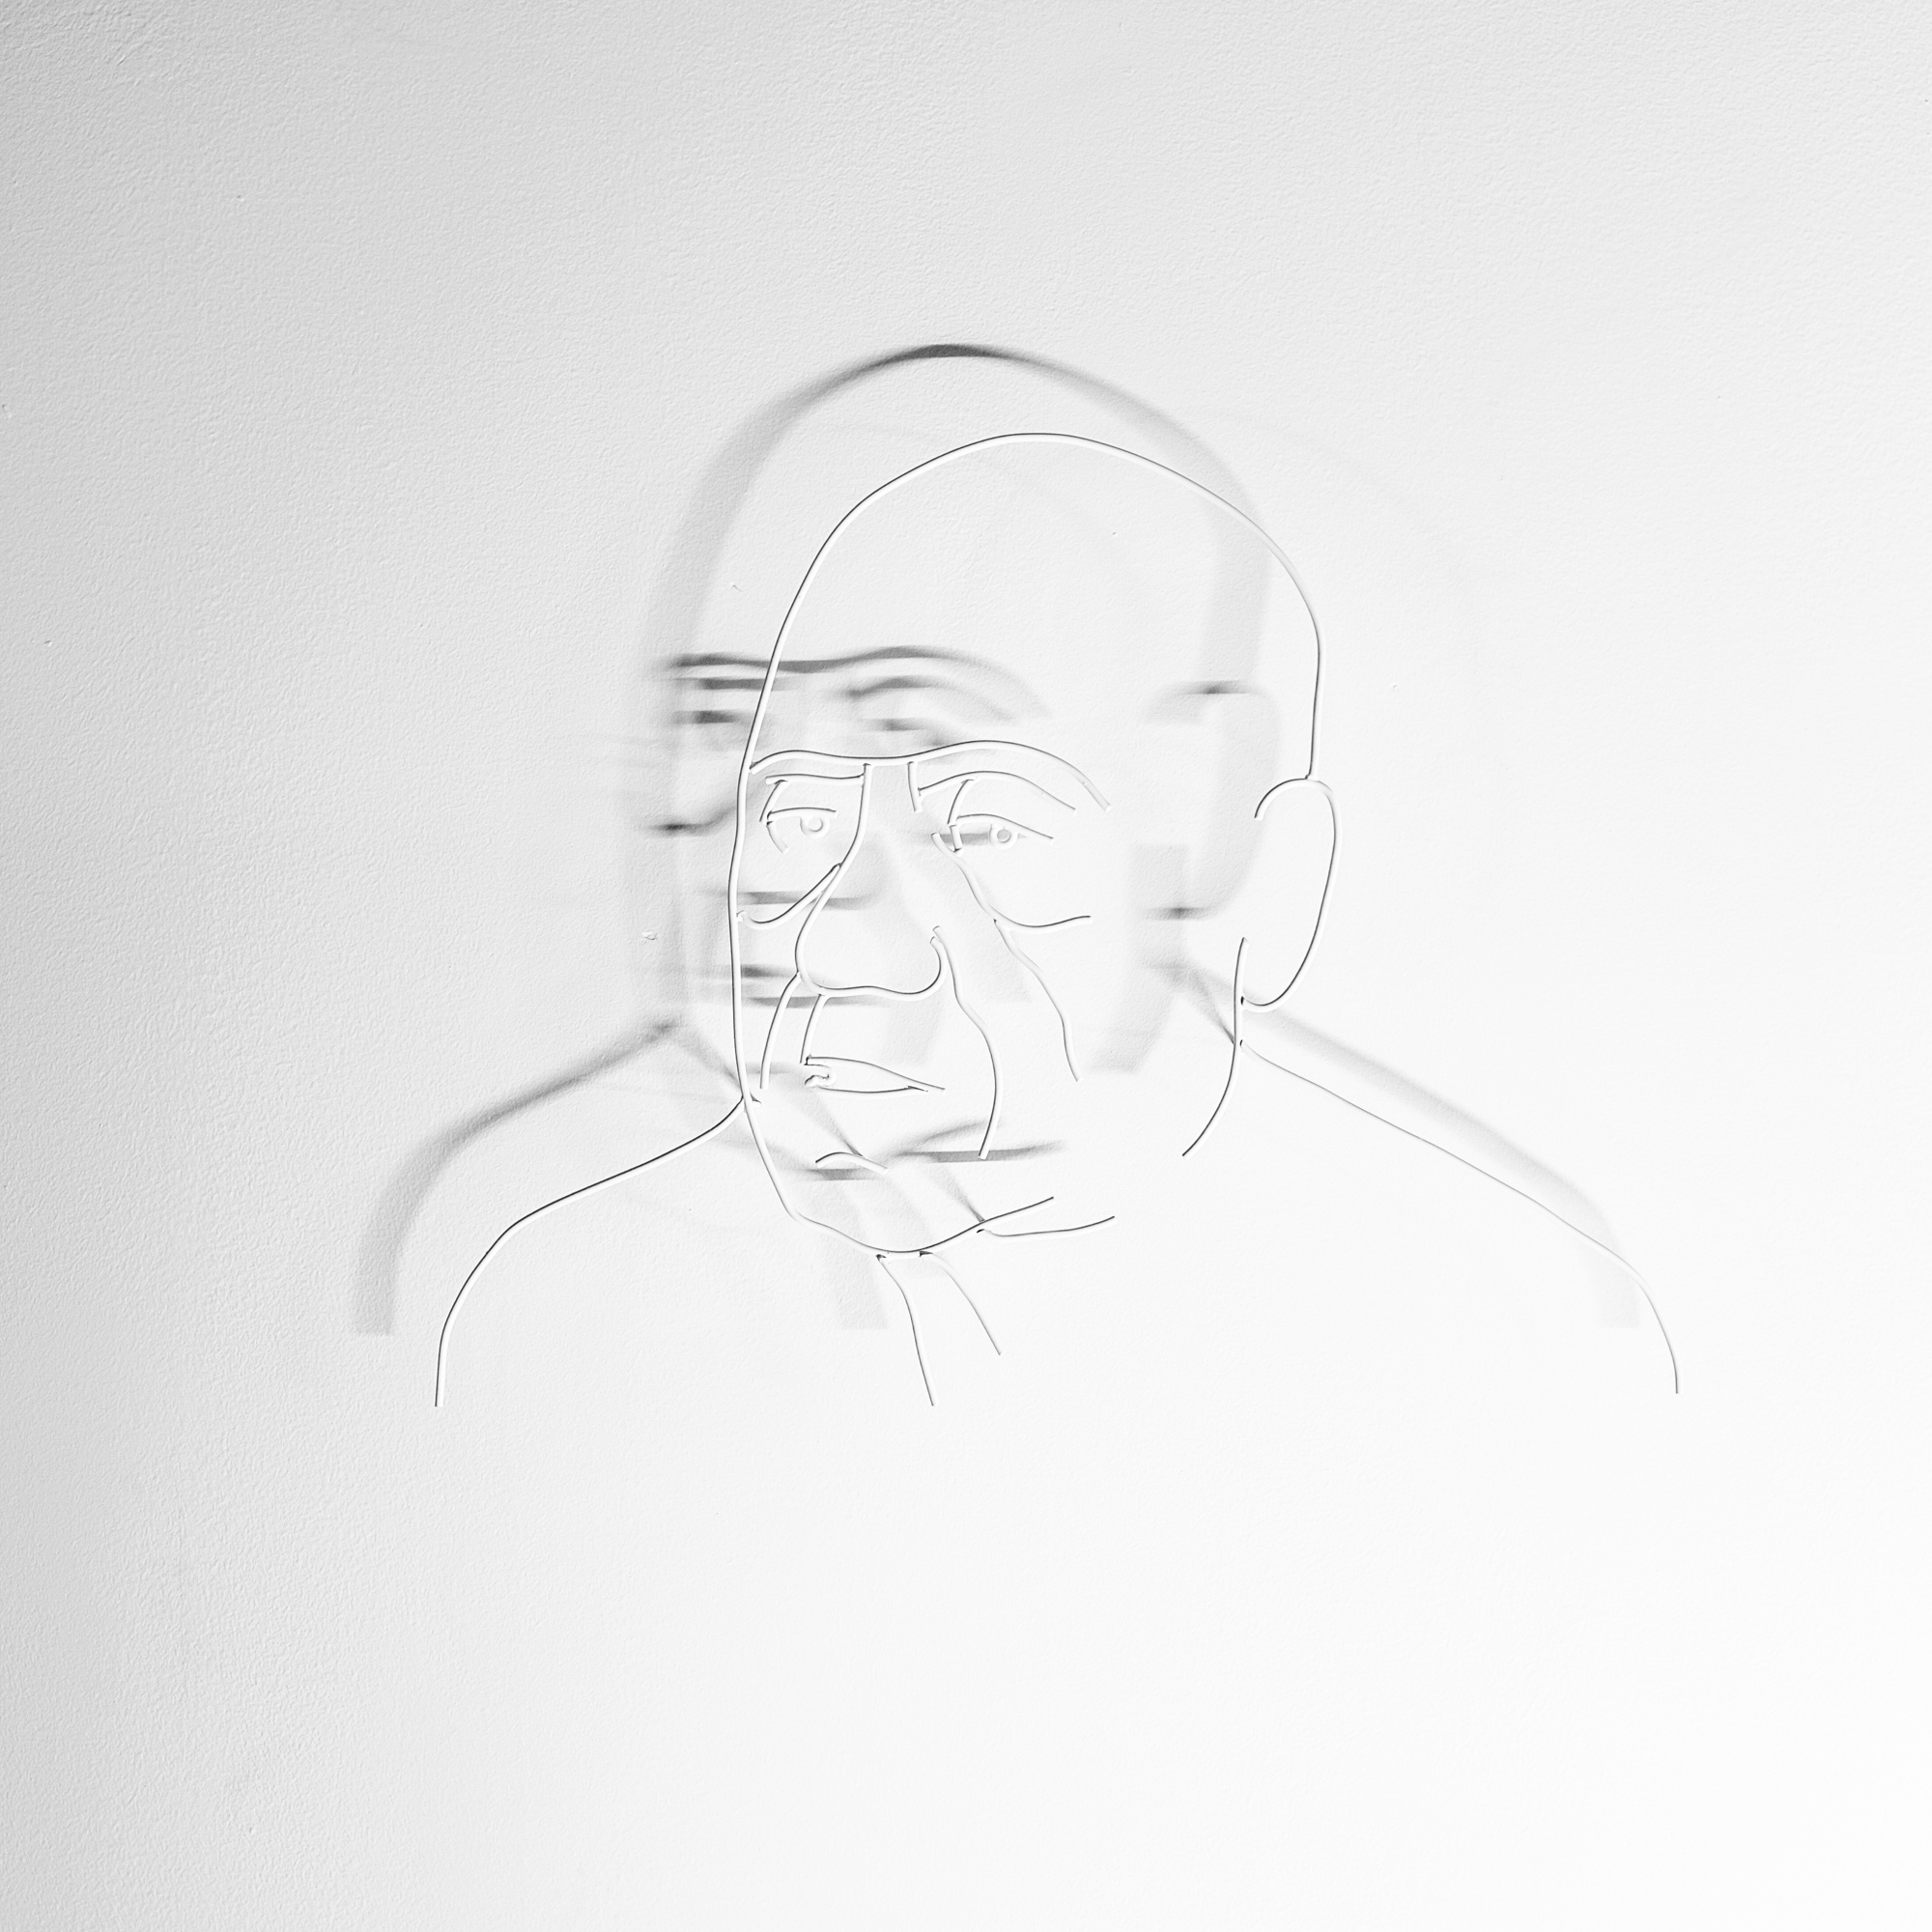 emil-taschka-so-long-old-man-04